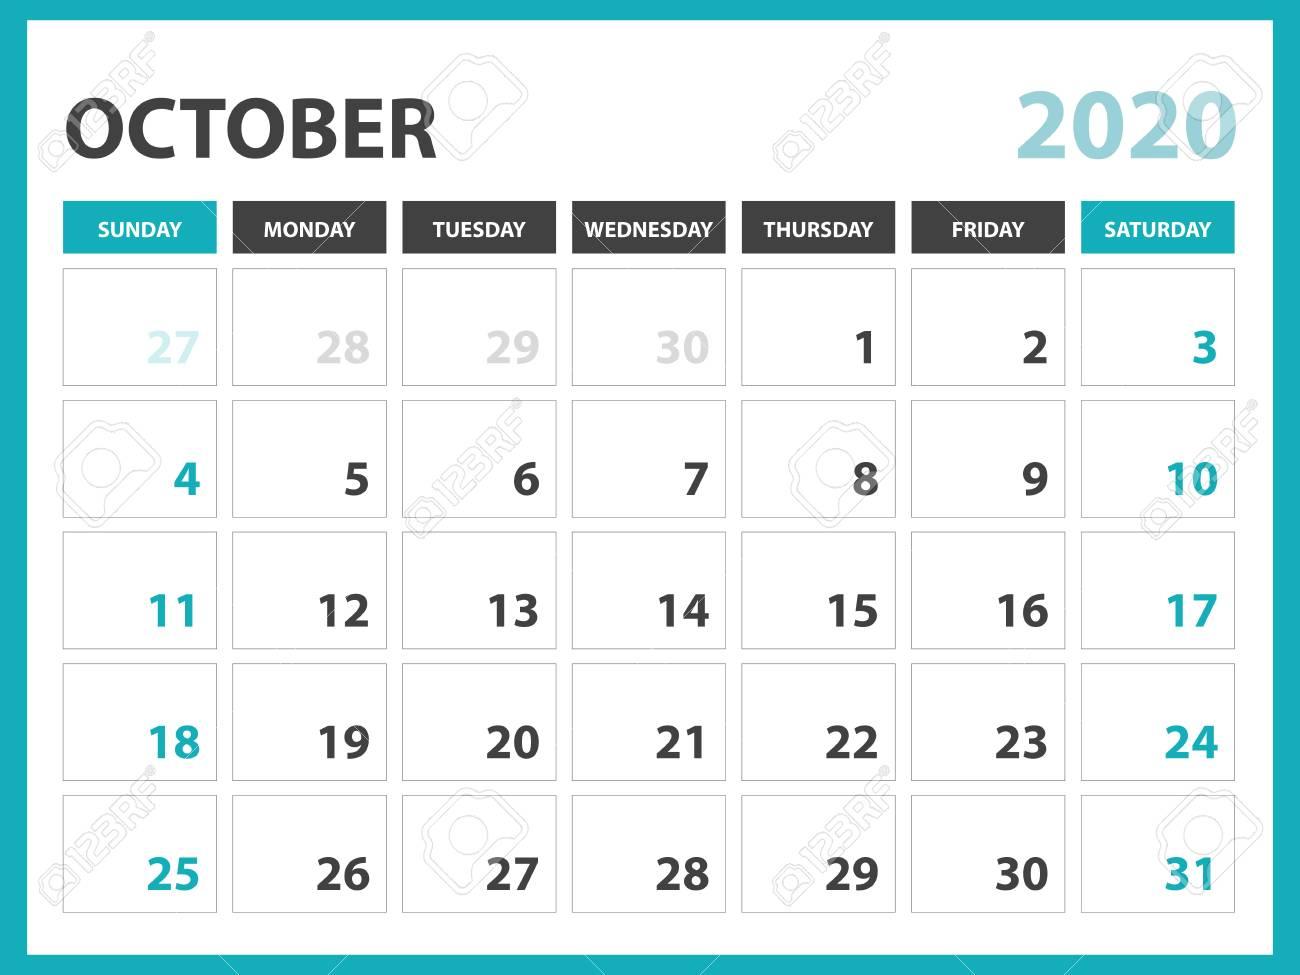 Desk Calendar 2020.Desk Calendar Layout Size 8 X 6 Inch October 2020 Calendar